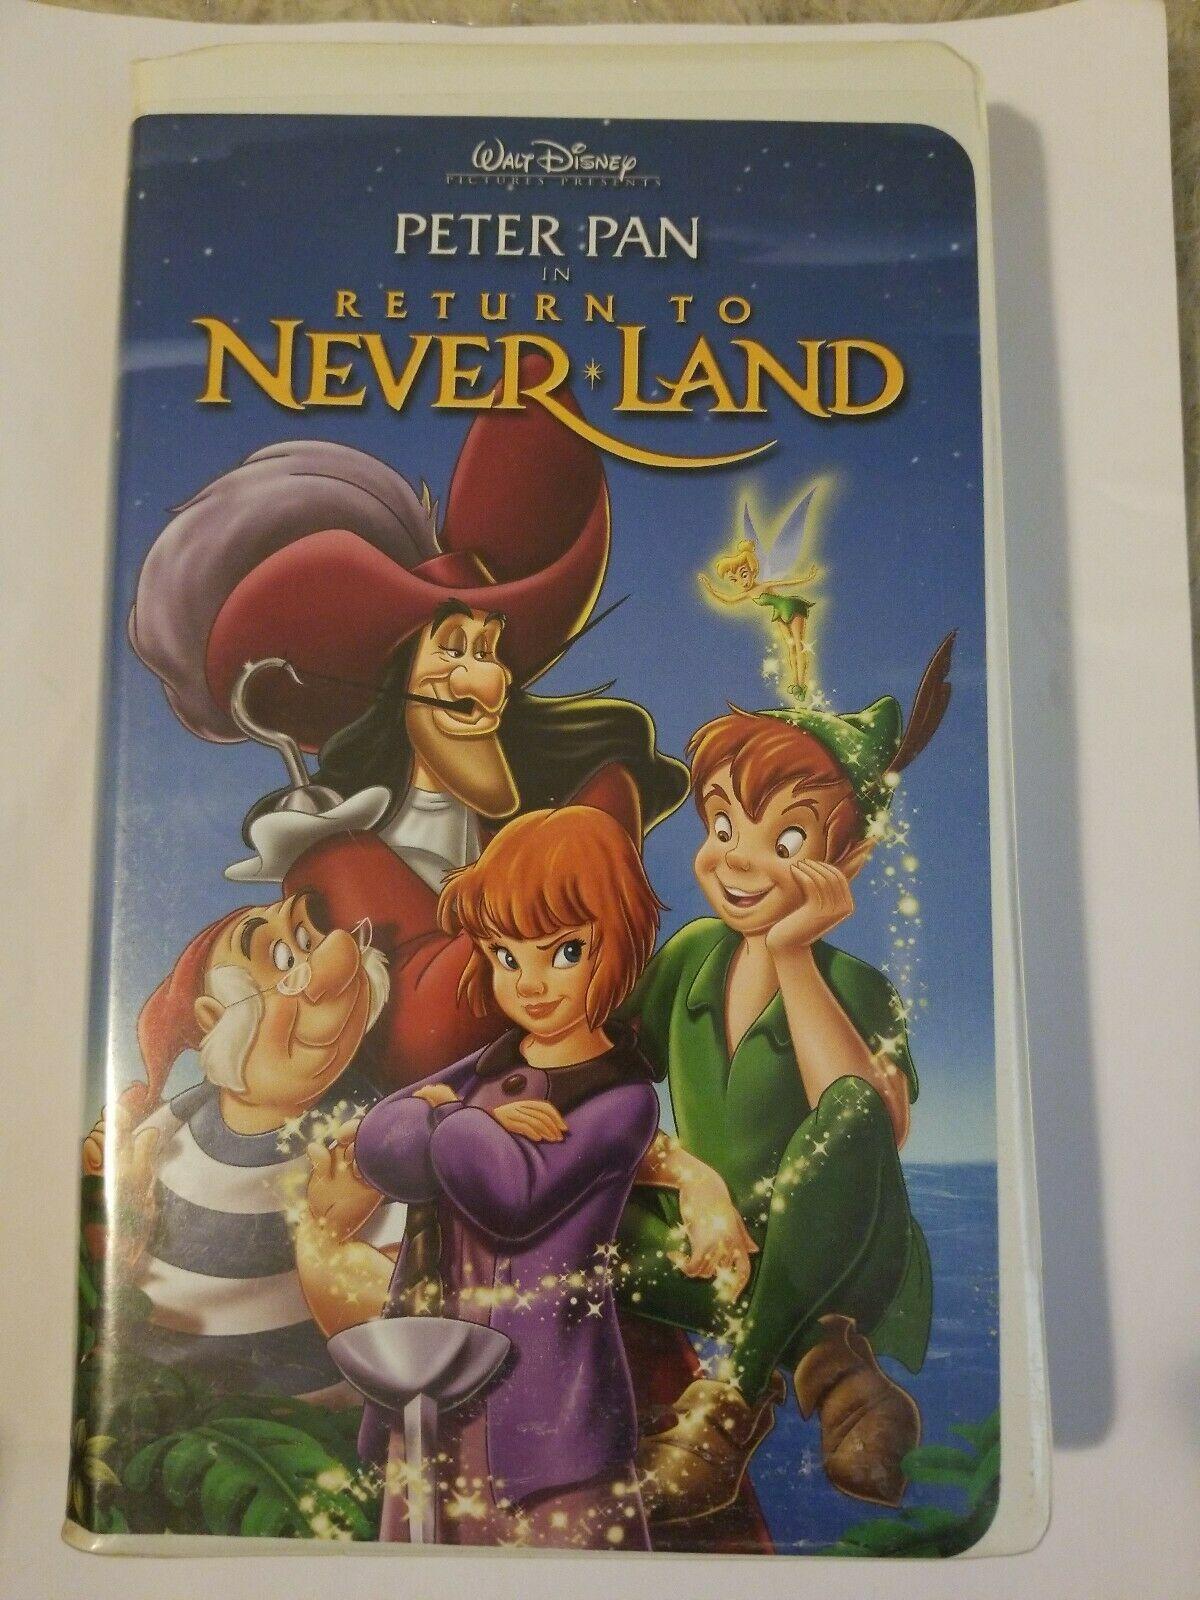 Return to Never Land (2002 DVD/VHS)